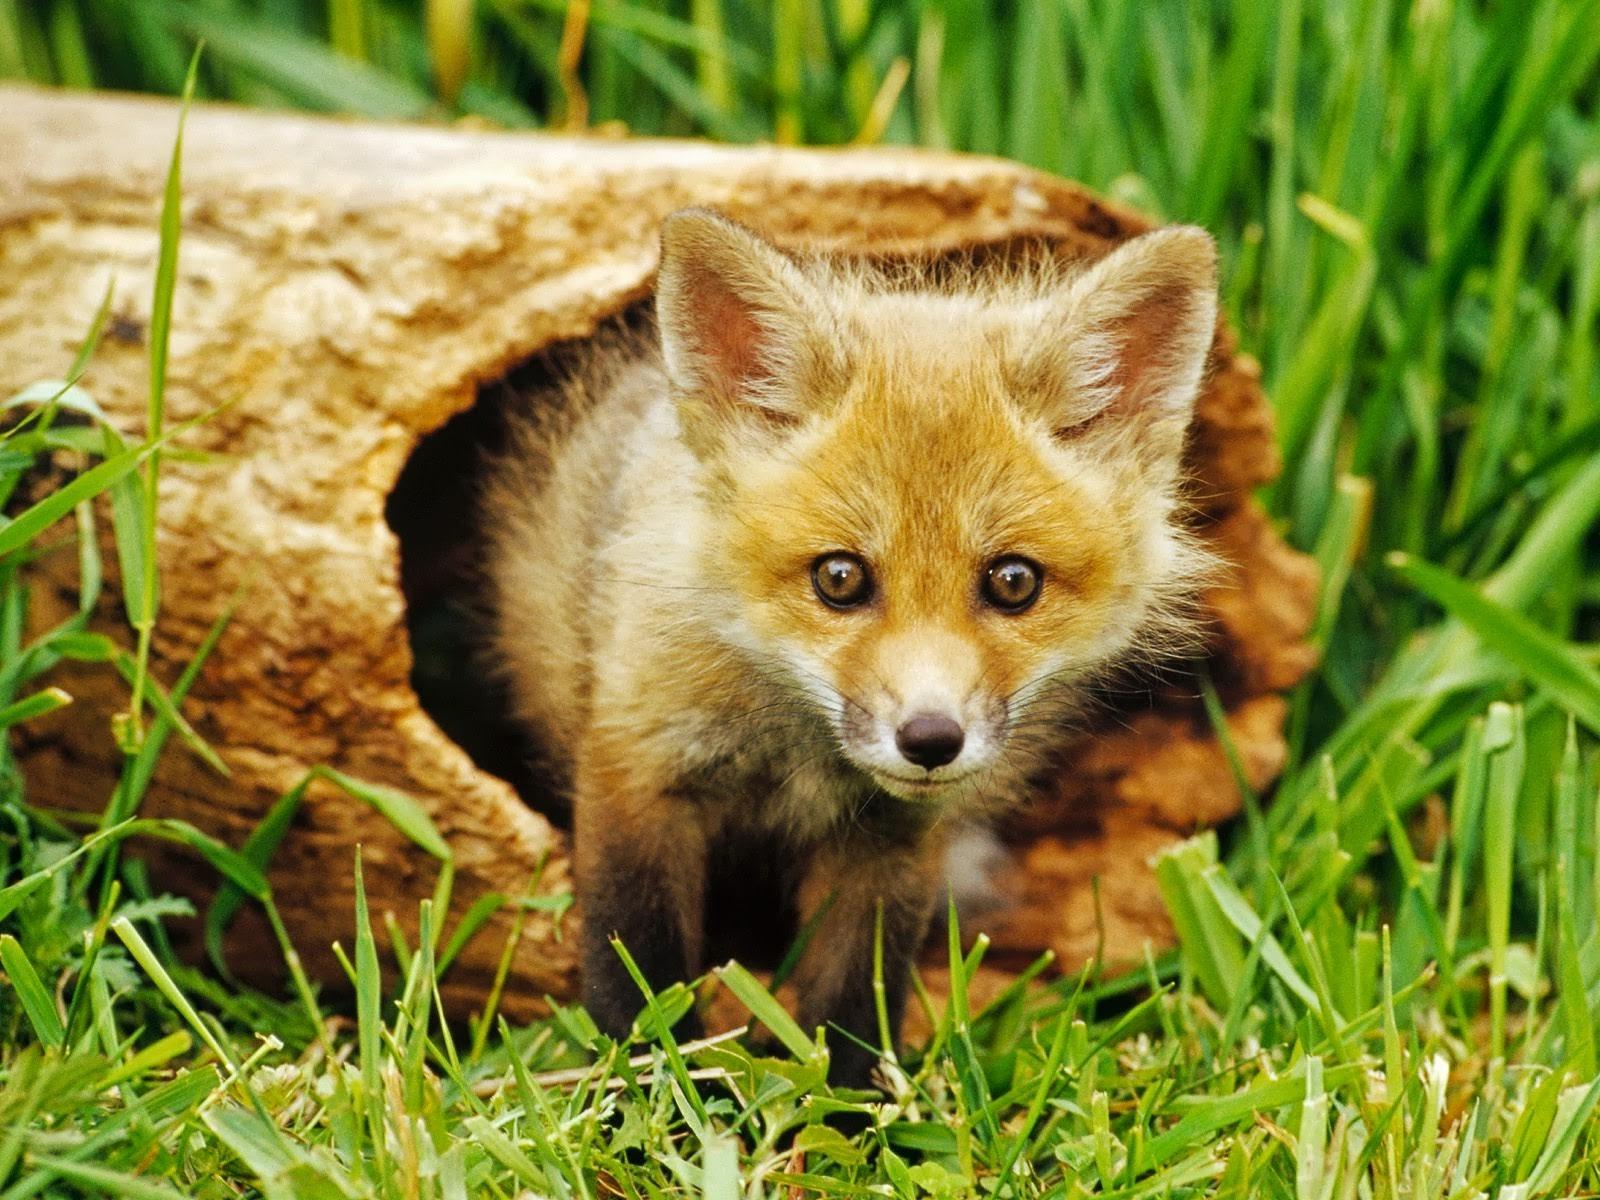 Wallpaper 1600x1200 Px Baby Animals Fox Nature 1600x1200 Goodfon 750303 Hd Wallpapers Wallhere